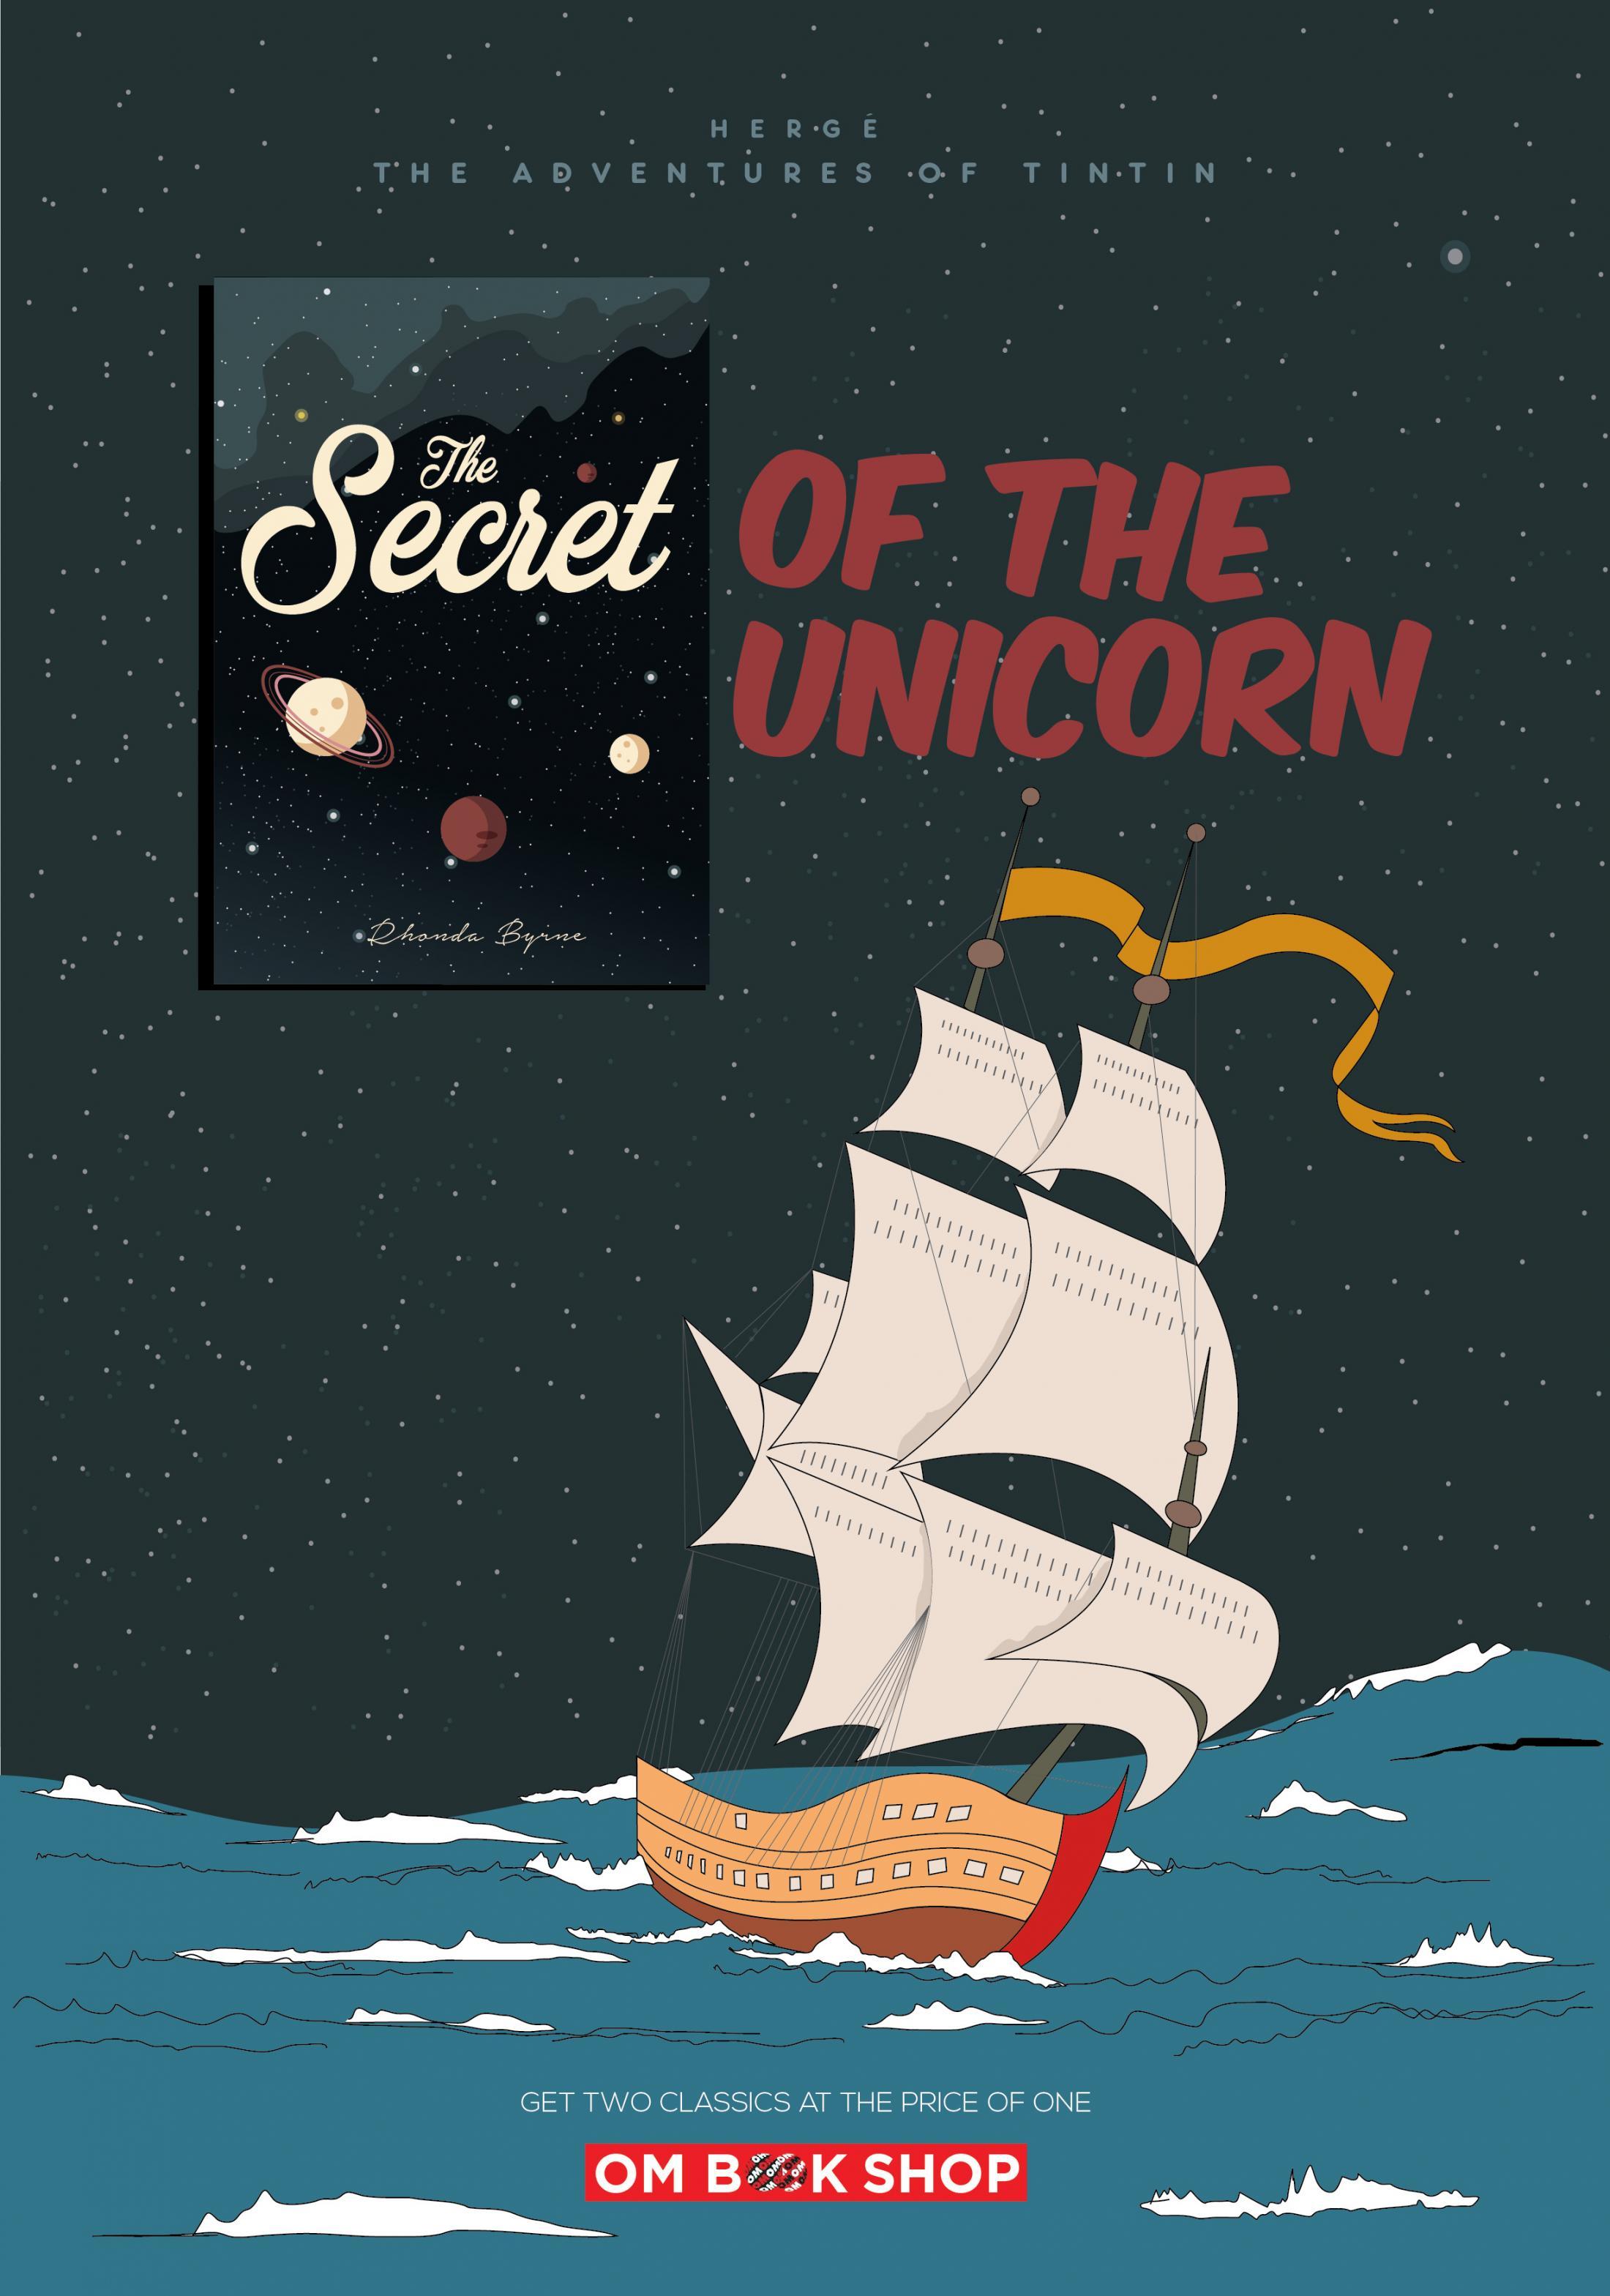 OM Book Shop Print Ad - Secret Of The Unicorn